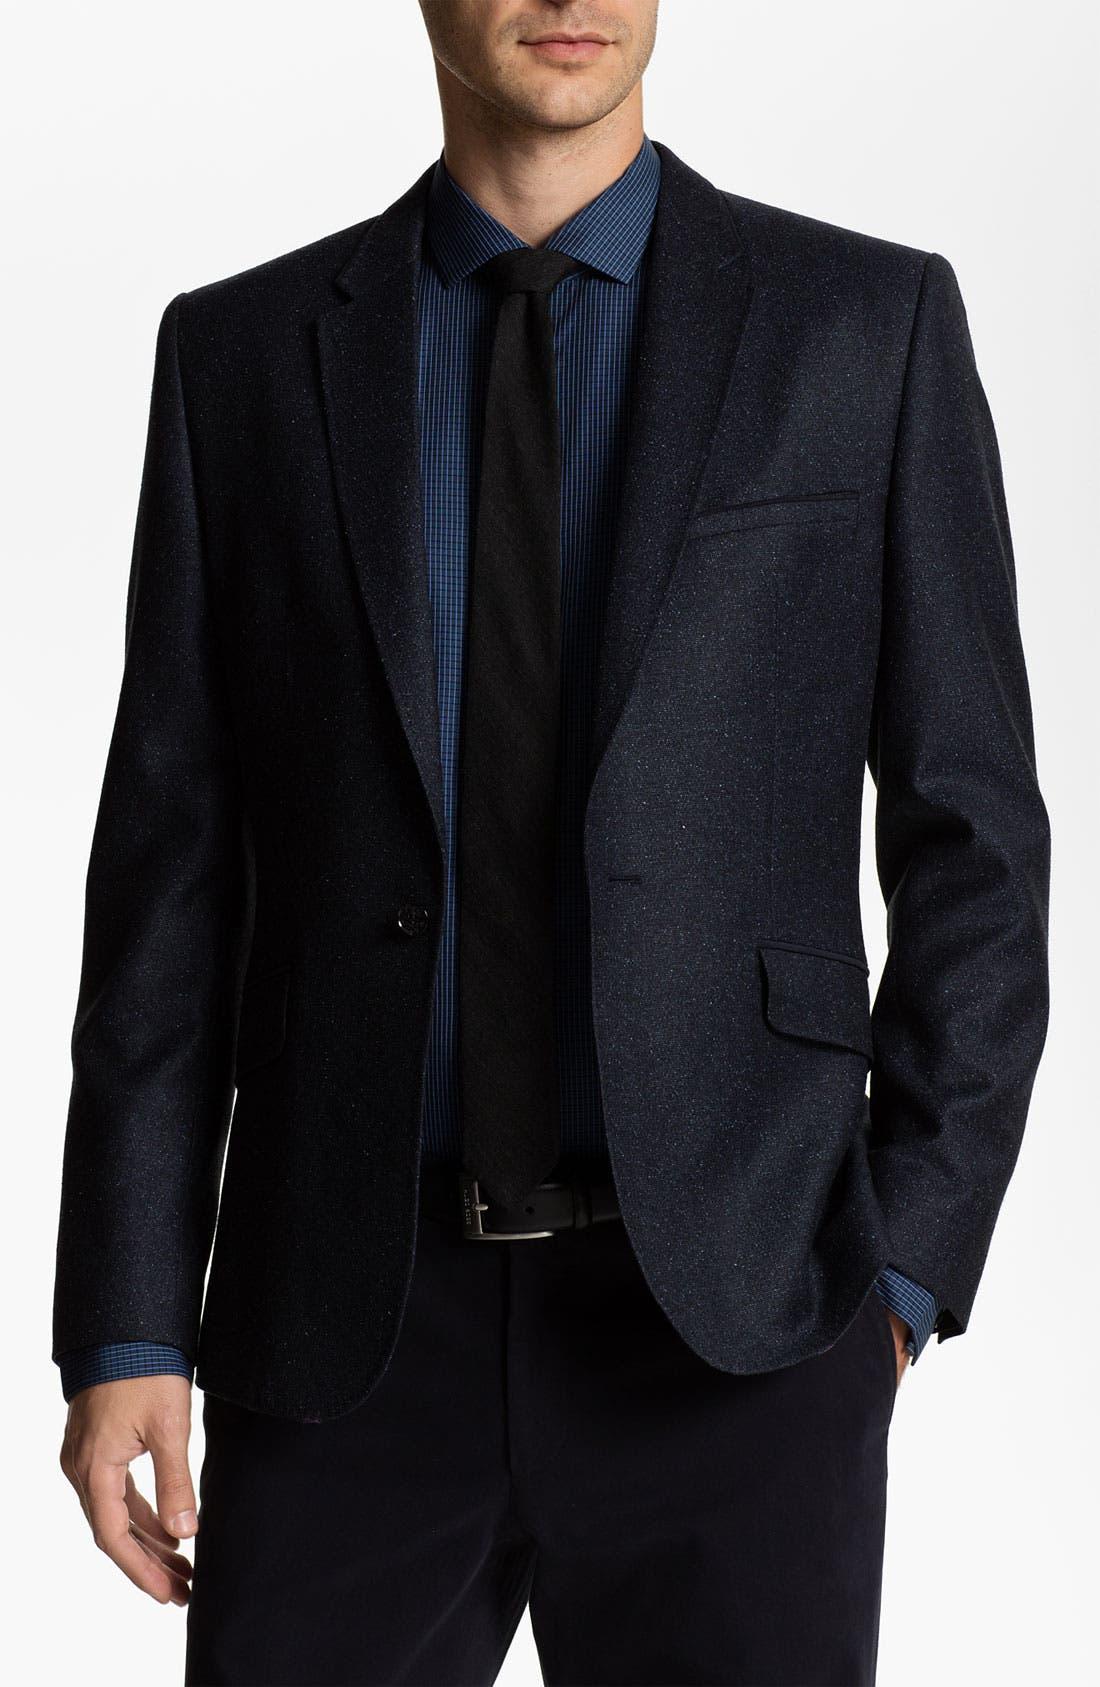 Main Image - Ted Baker London Trim Fit Donegal Tweed Blazer